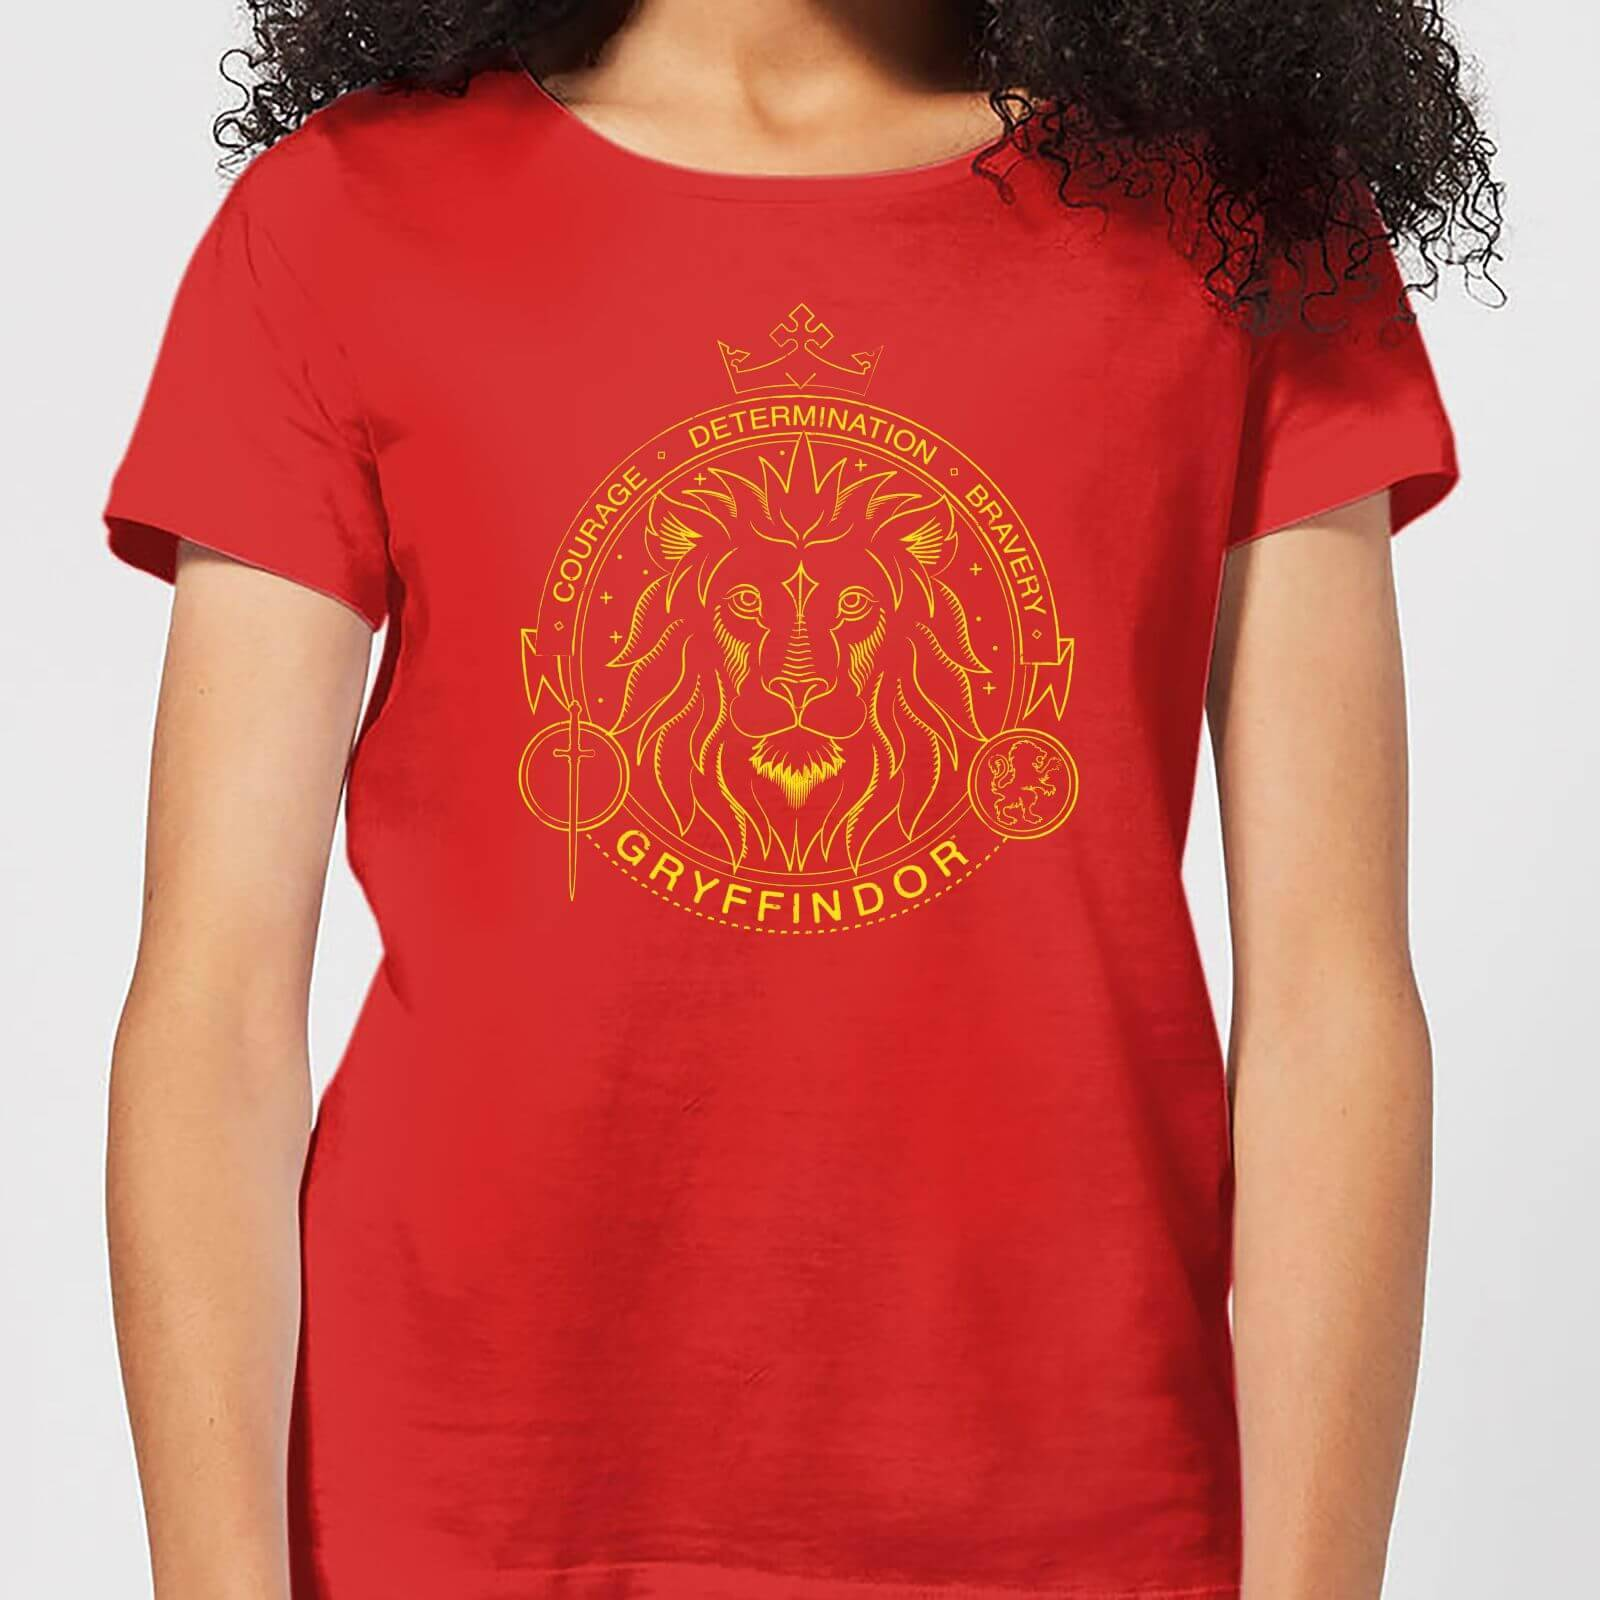 Harry Potter Gryffindor Lion Badge Women's T-Shirt - Red - XL - Rouge